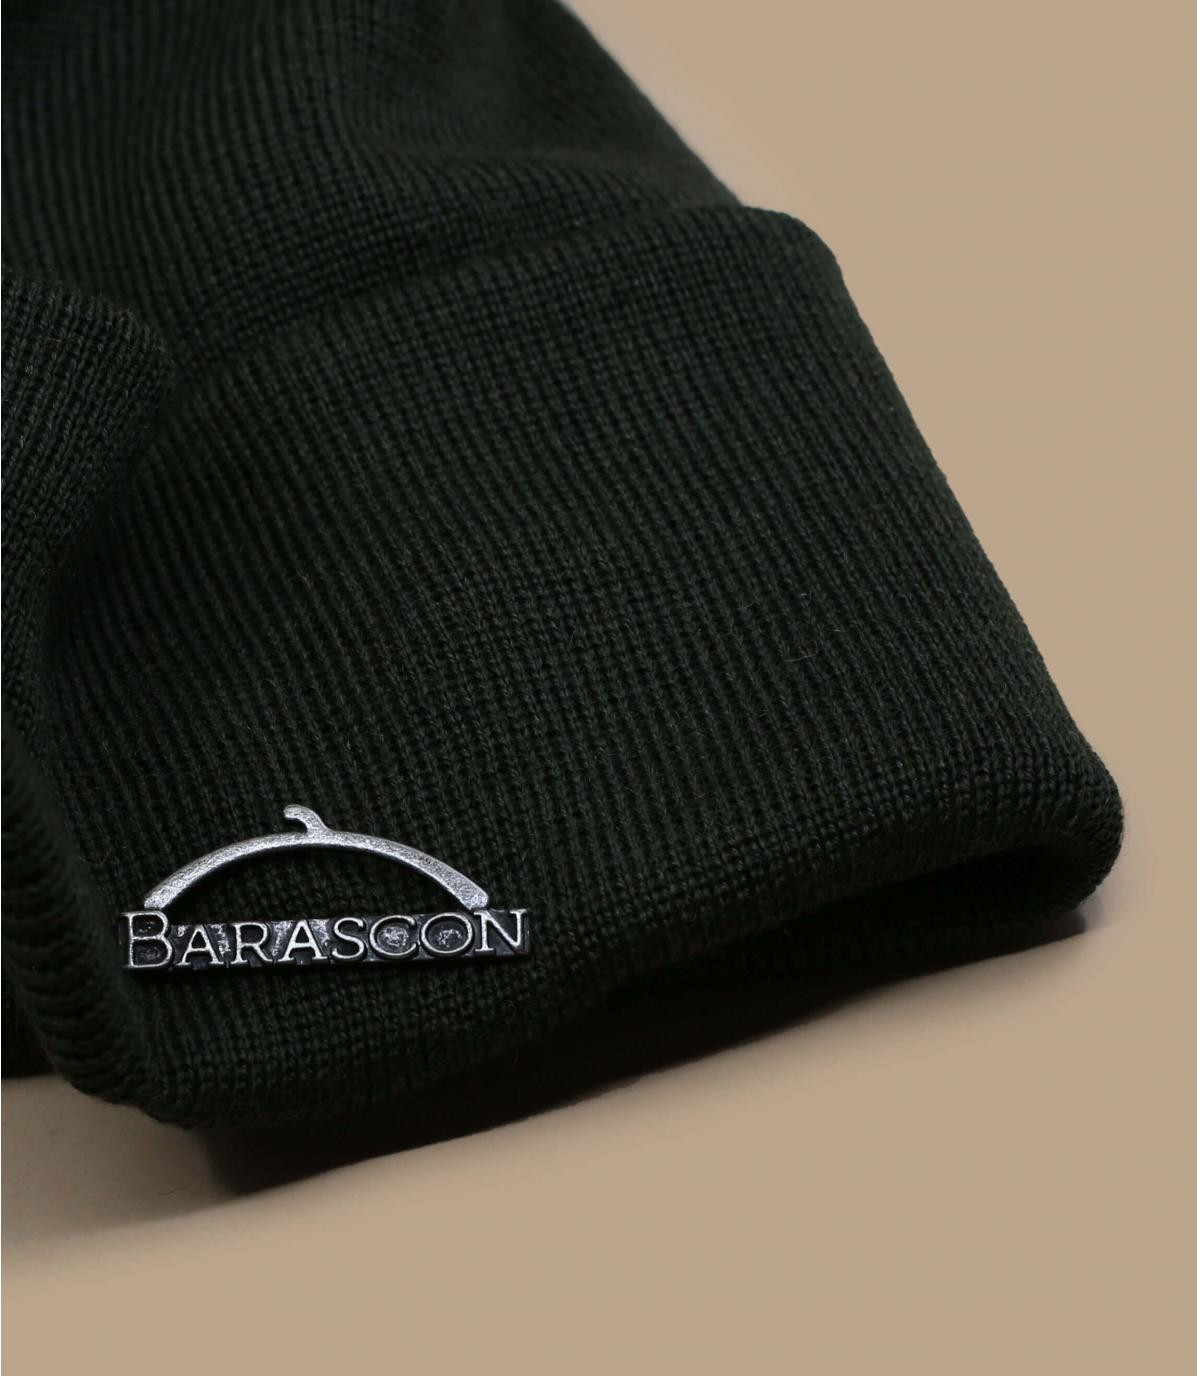 Details Barascon Beanie Wool Acryl green - afbeeling 1